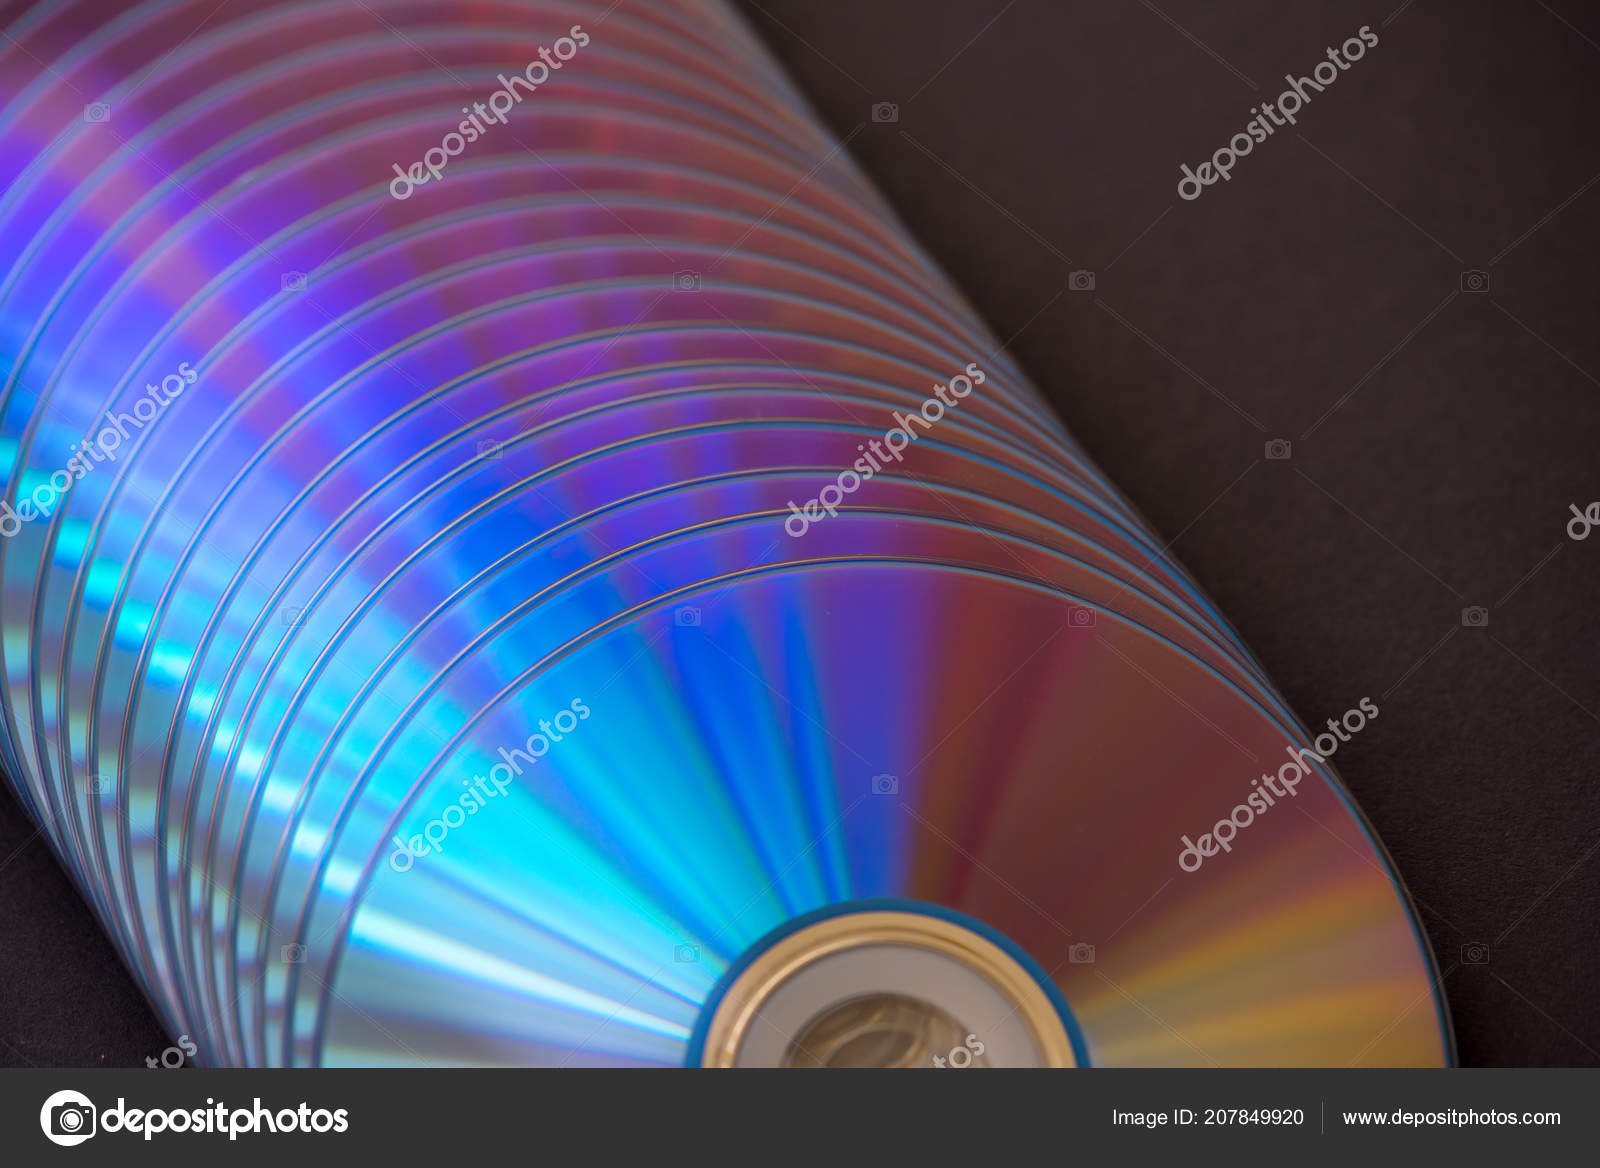 dvd skivor